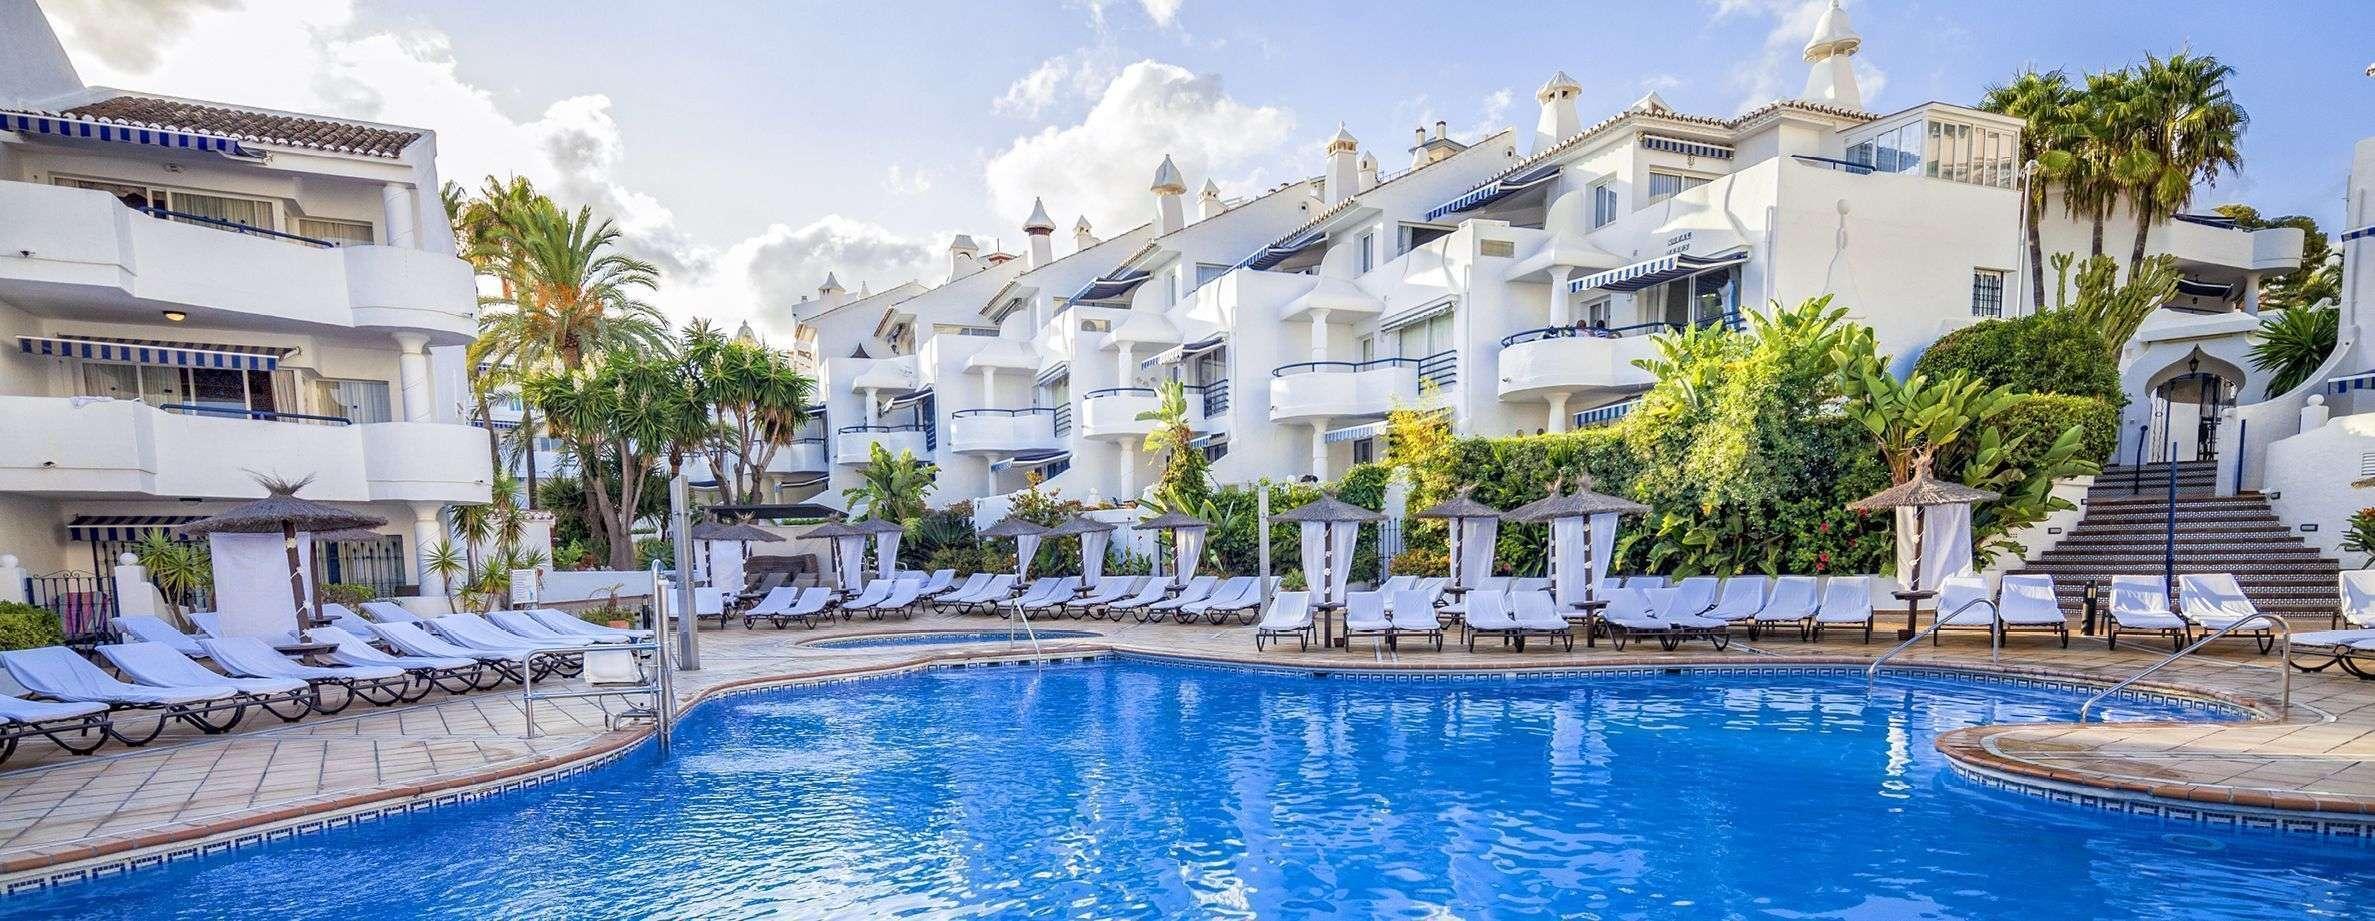 Sahara Sunset Malaga Diamond Resorts and Hotels